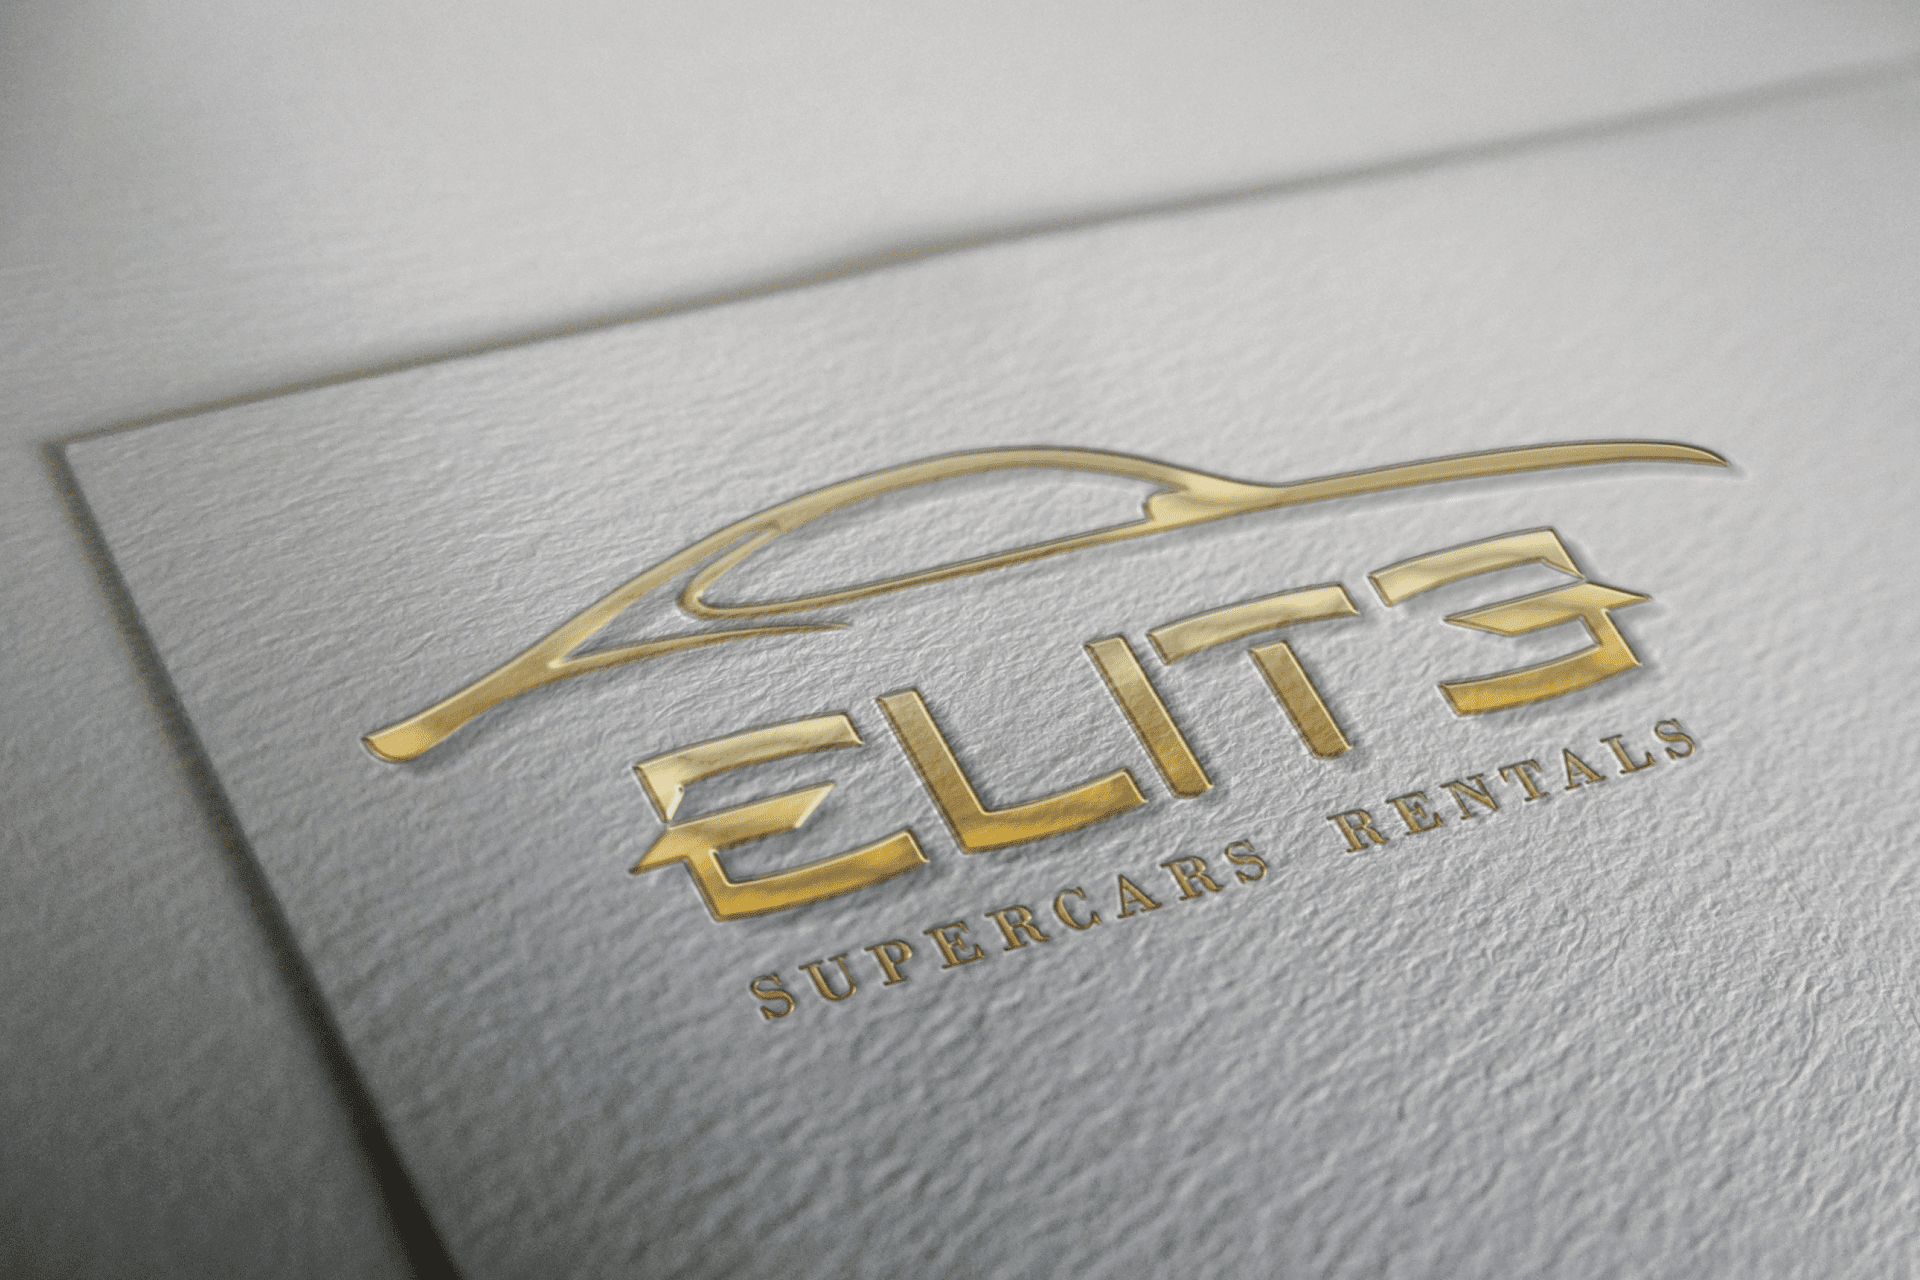 The Ads - Elite Supercars Rentals